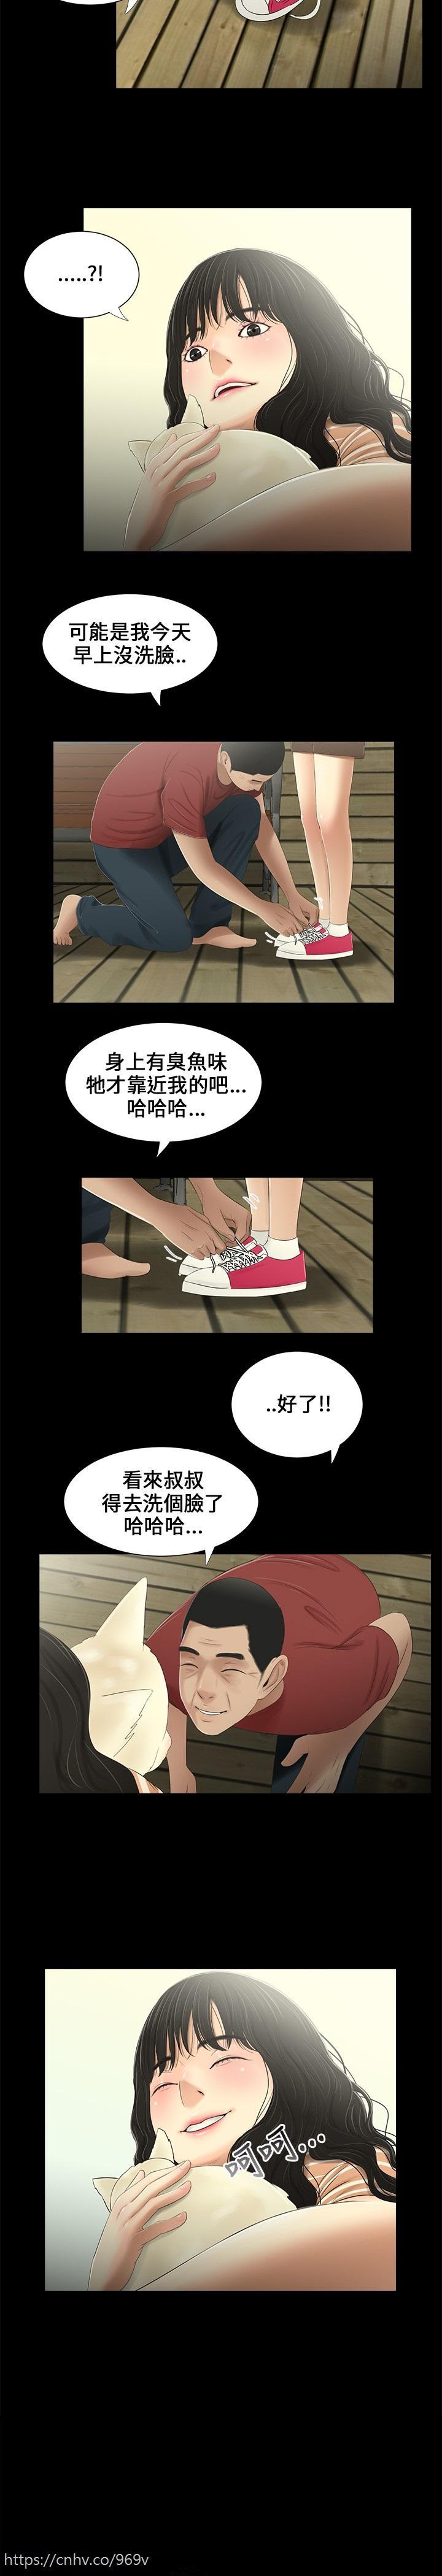 Three sisters 三姐妹Ch.13~19 (Chinese)中文 20